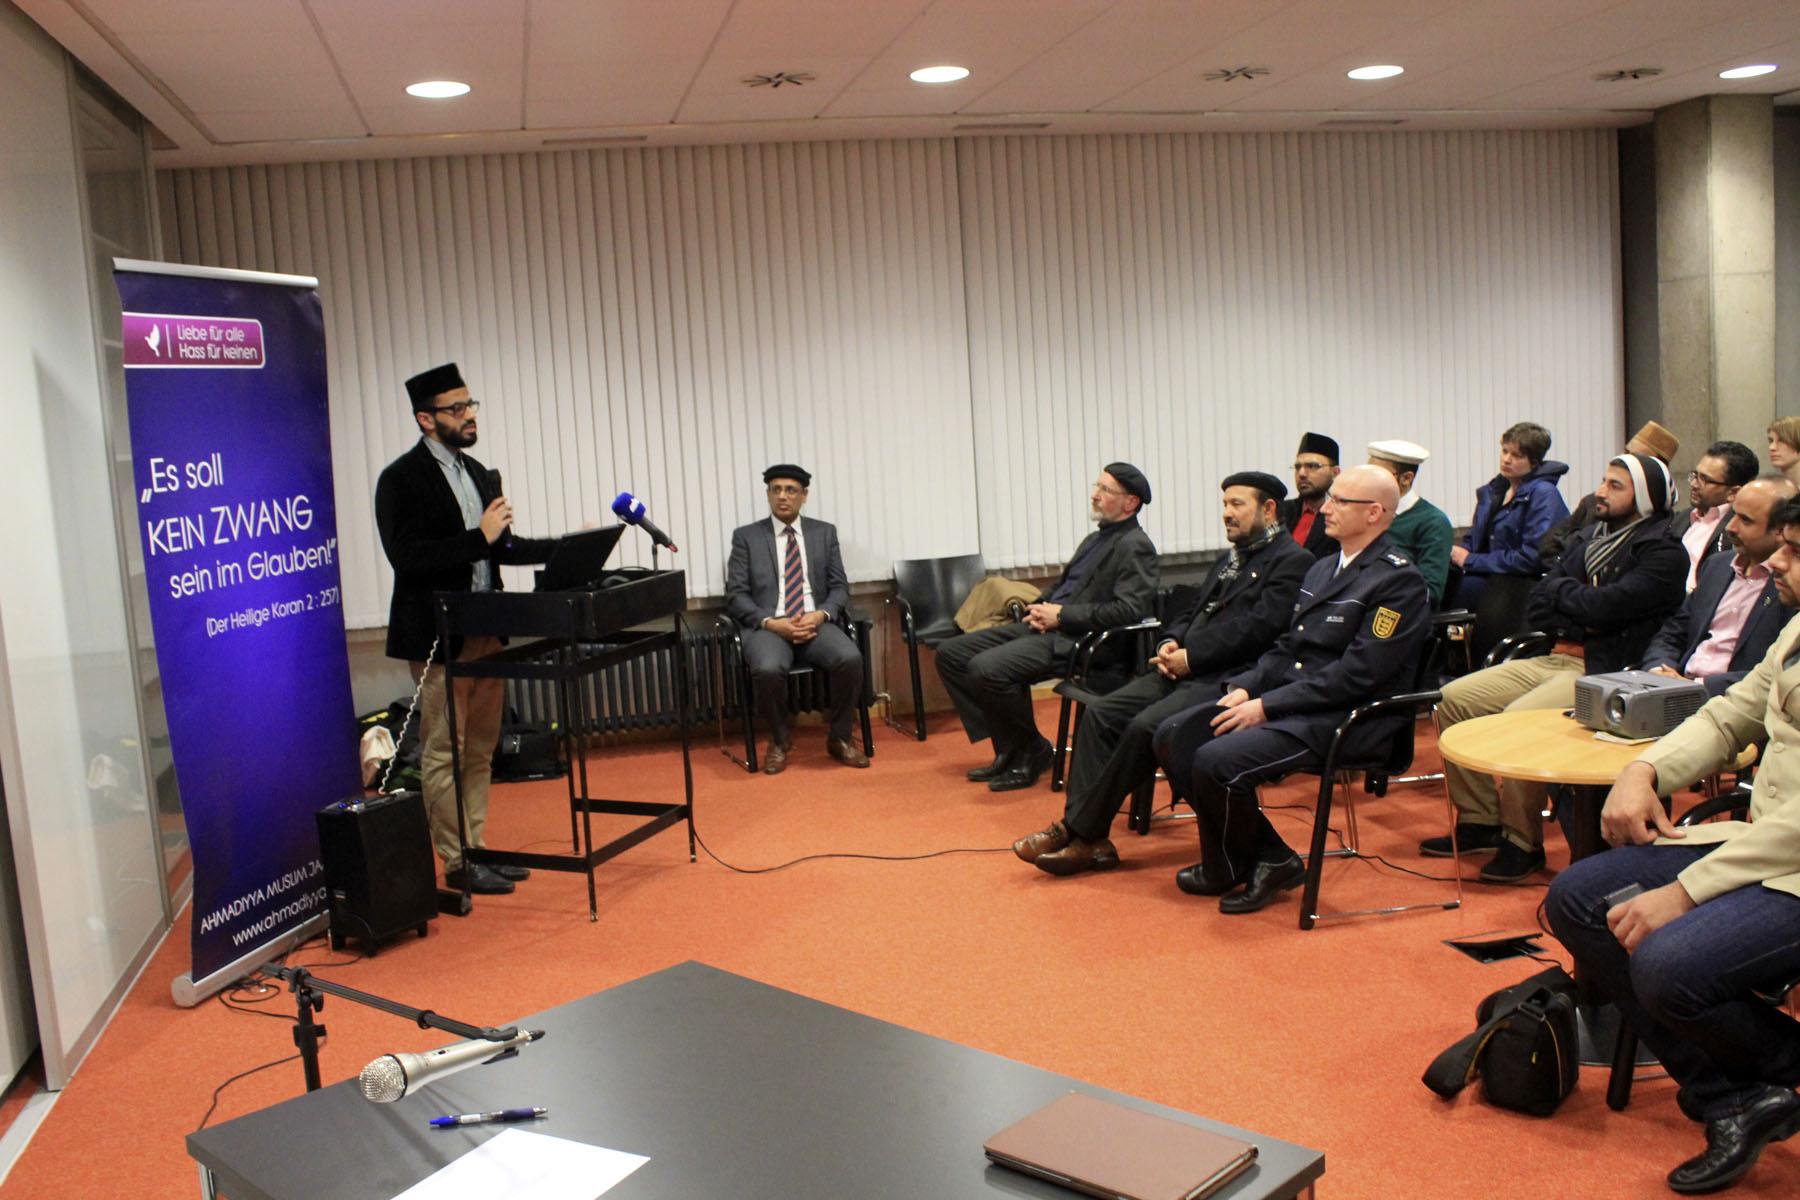 heidelberg muslim Meet german arabs on lovehabibi - the world's largest meeting place for german arabs and likeminded people around the world.